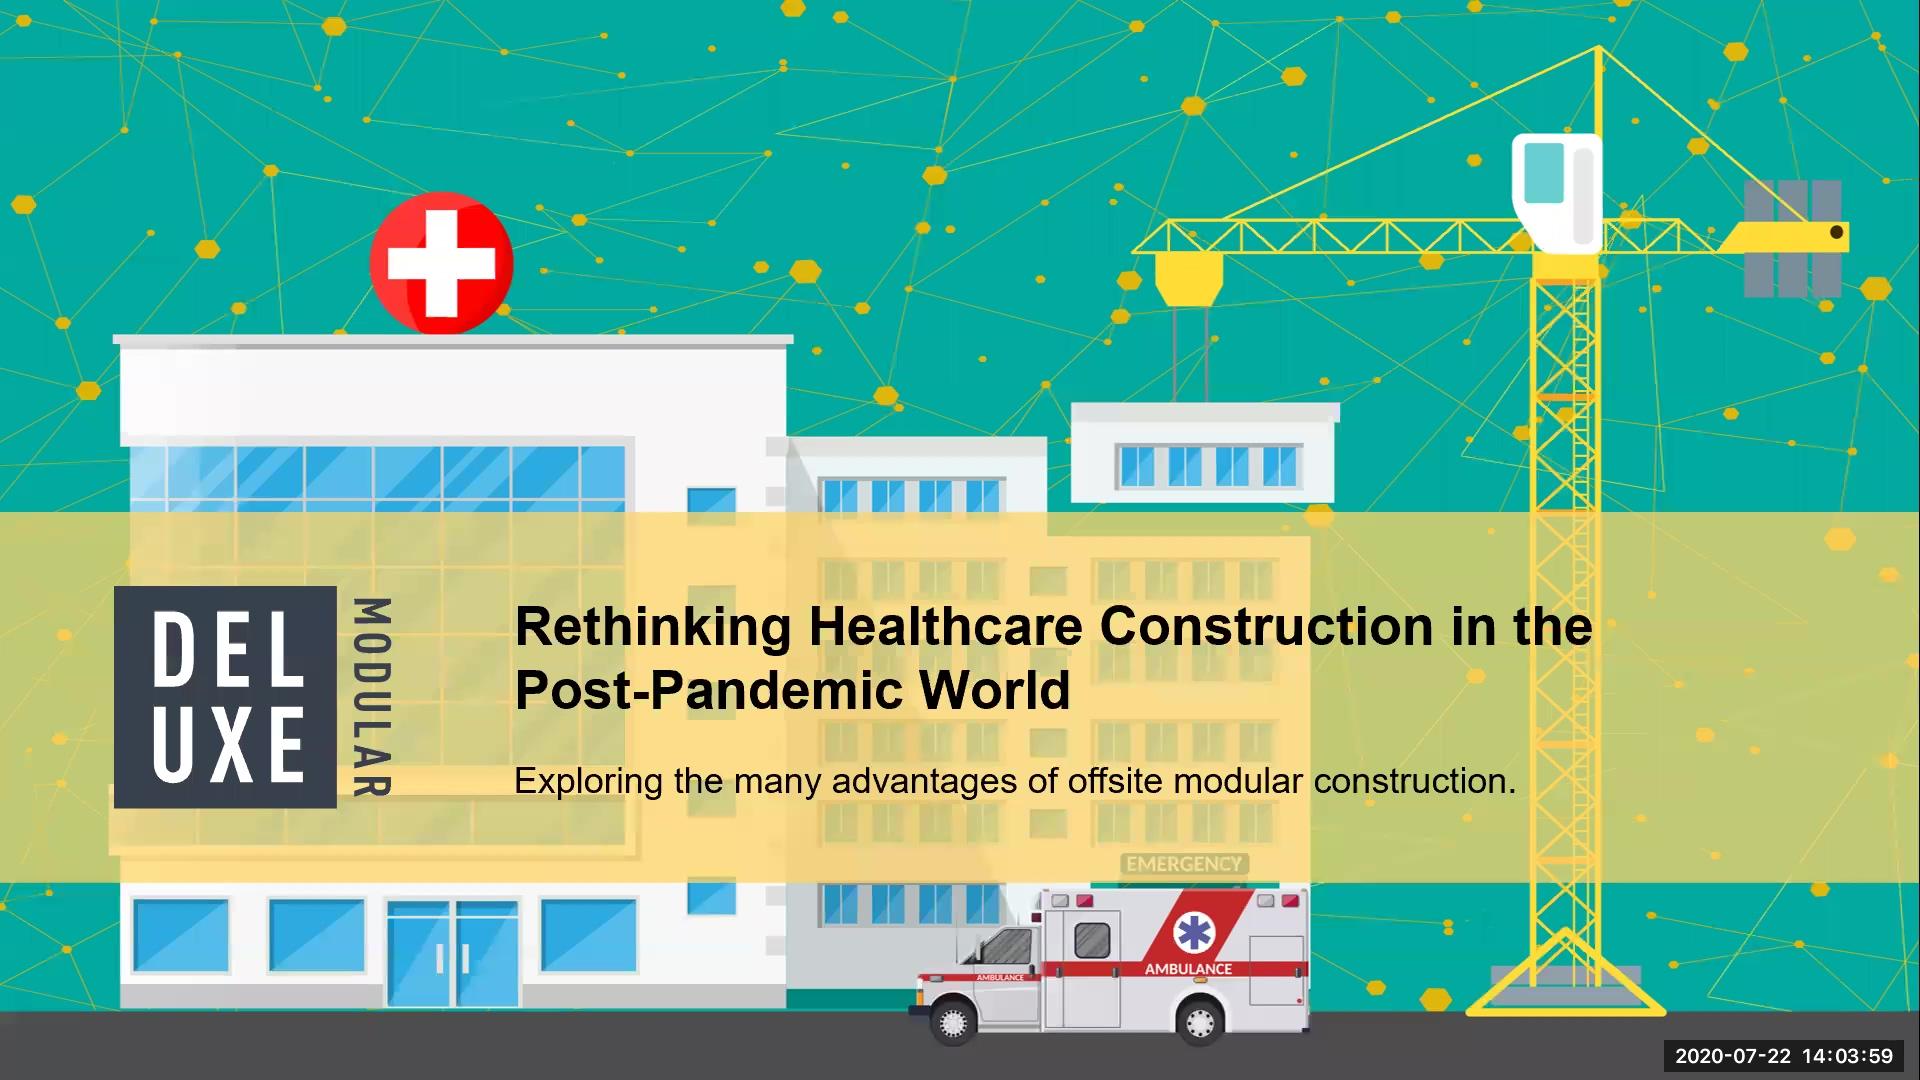 RethinkingHealthcareConstruction_July2020